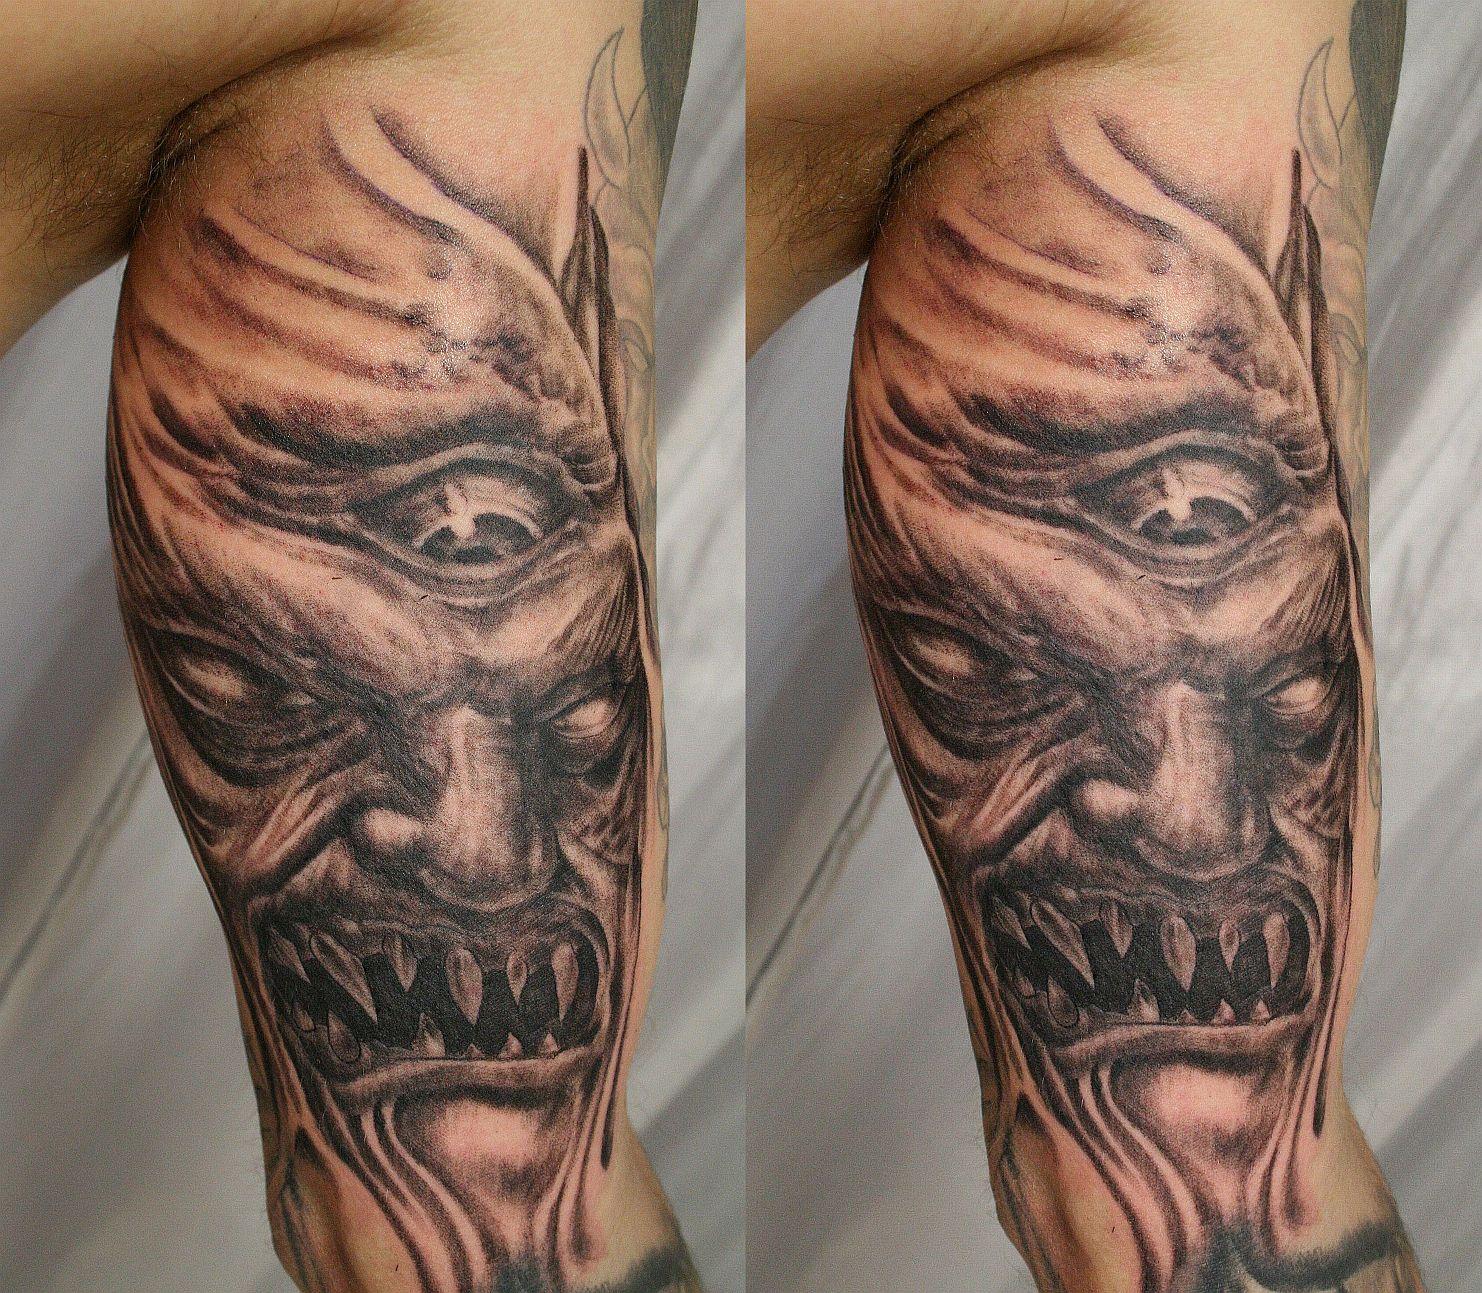 Demon Tattoos: 100's Of Demon Tattoo Design Ideas Pictures Gallery